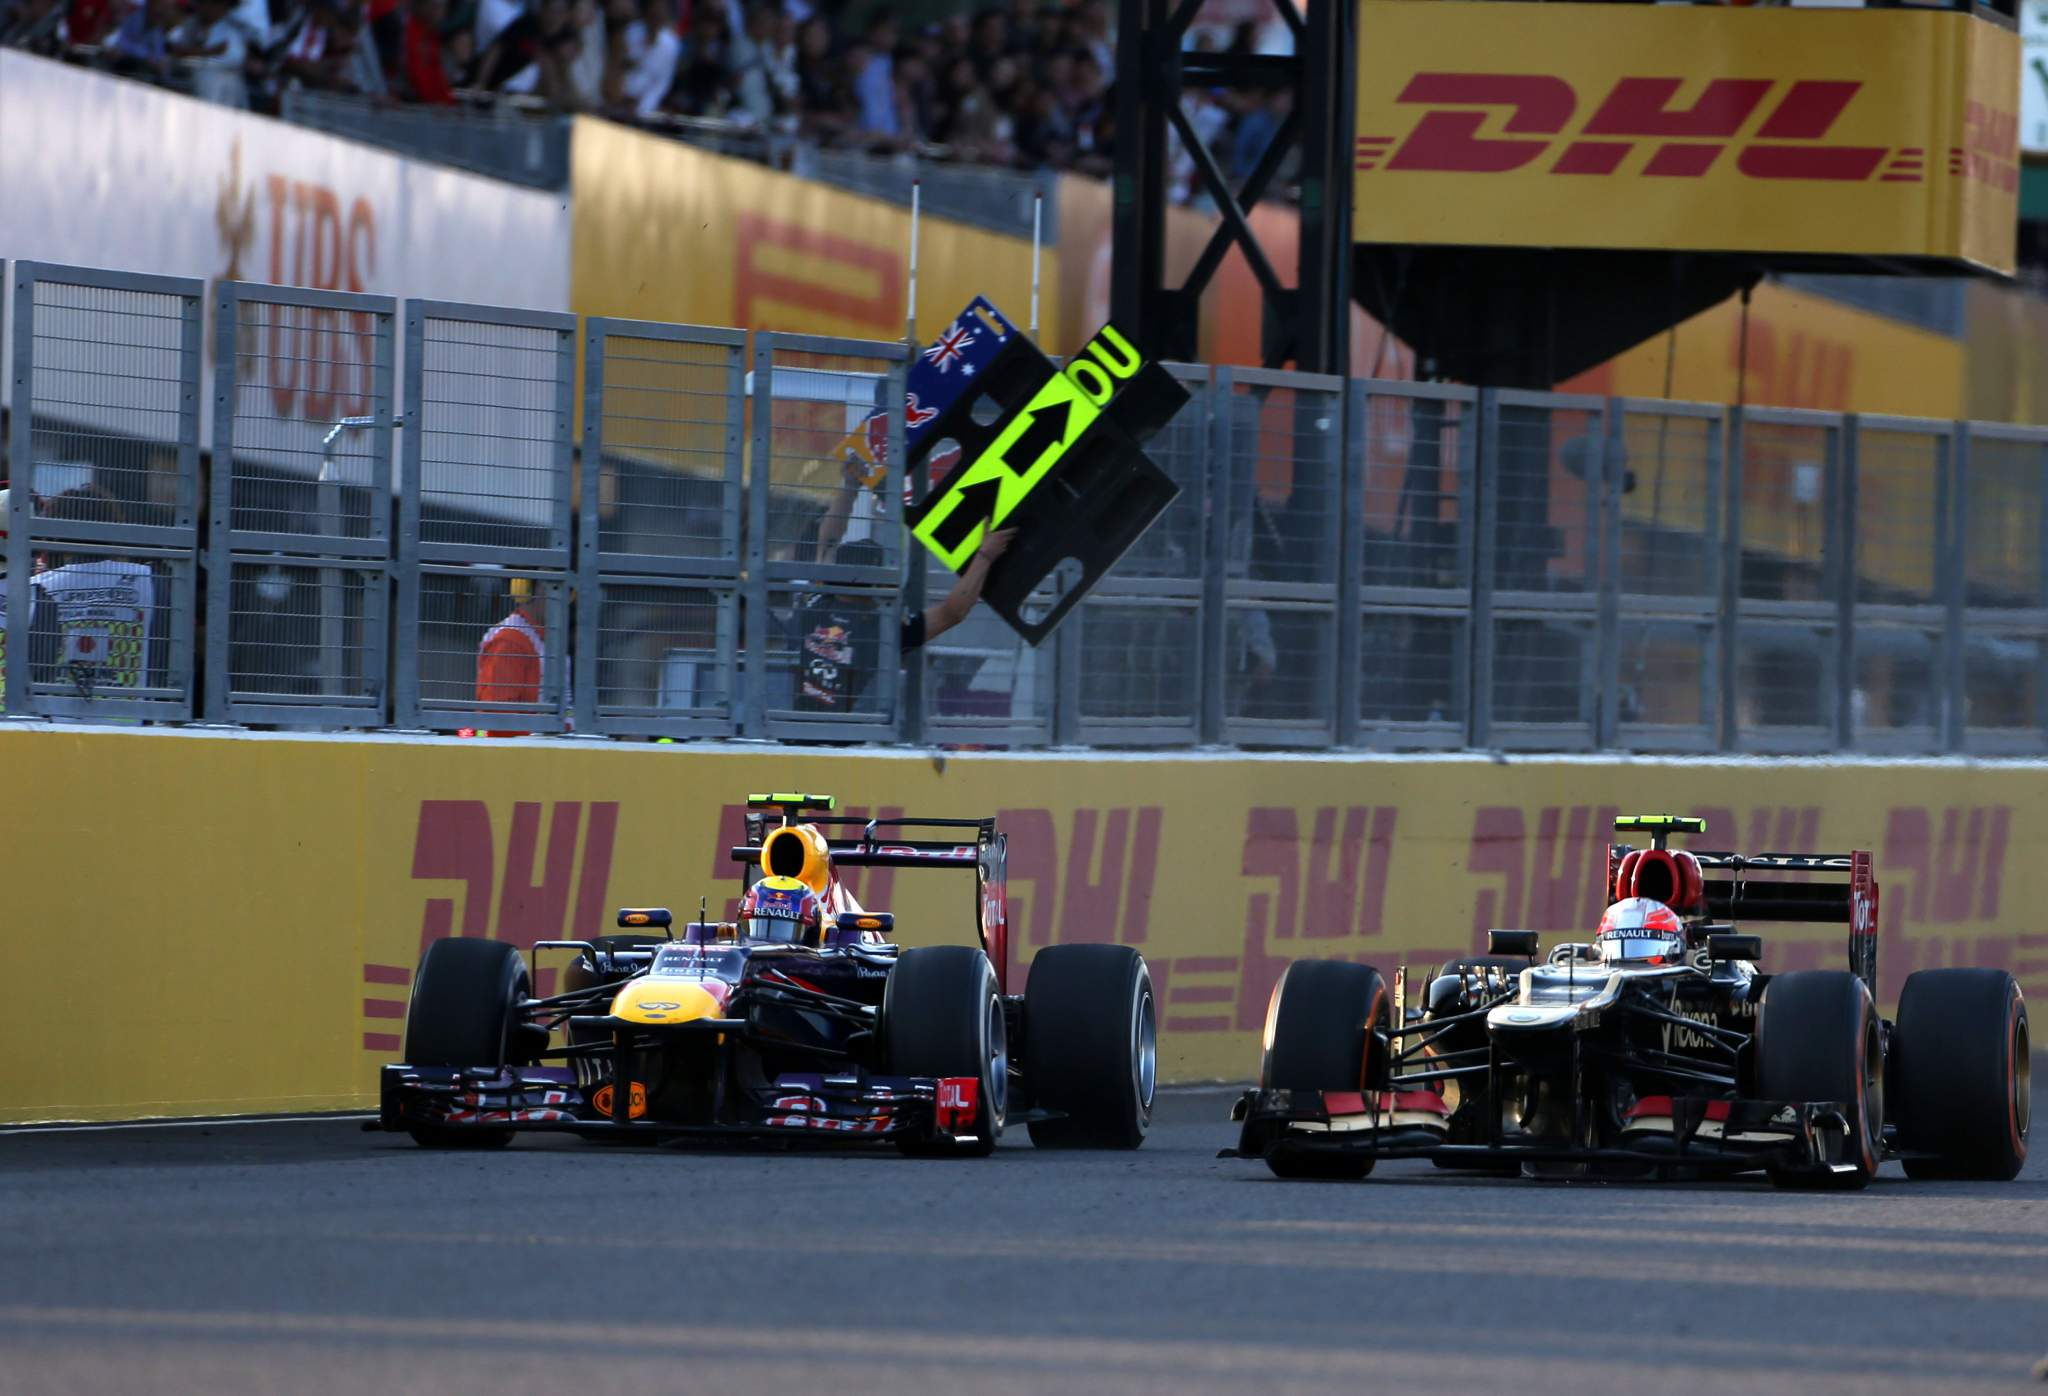 Motor Racing Formula One World Championship Japanese Grand Prix Race Day Suzuka, Japan